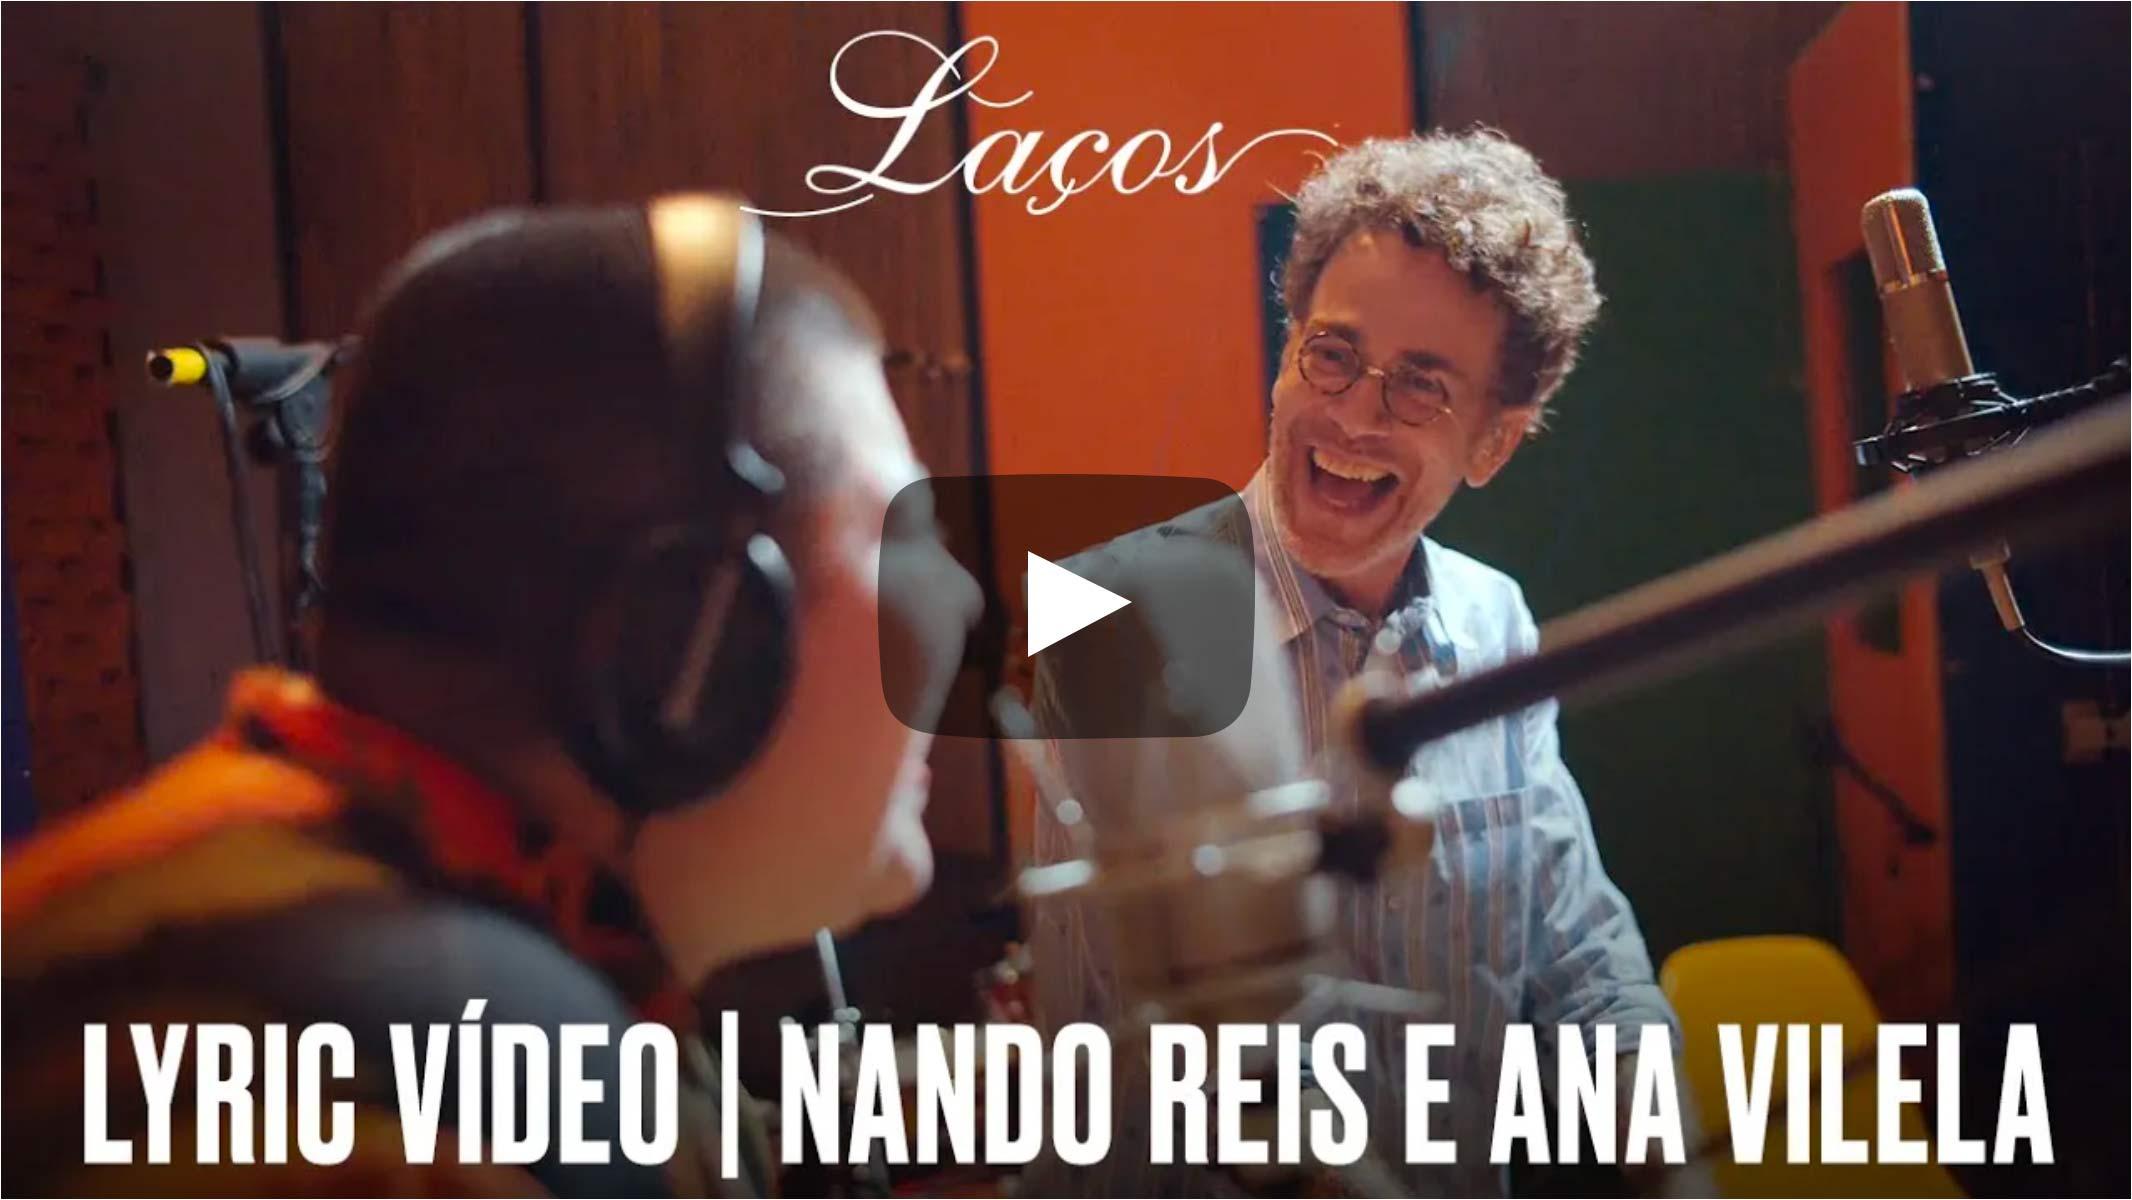 Video Lyric Nando Reis e Ana Vilela